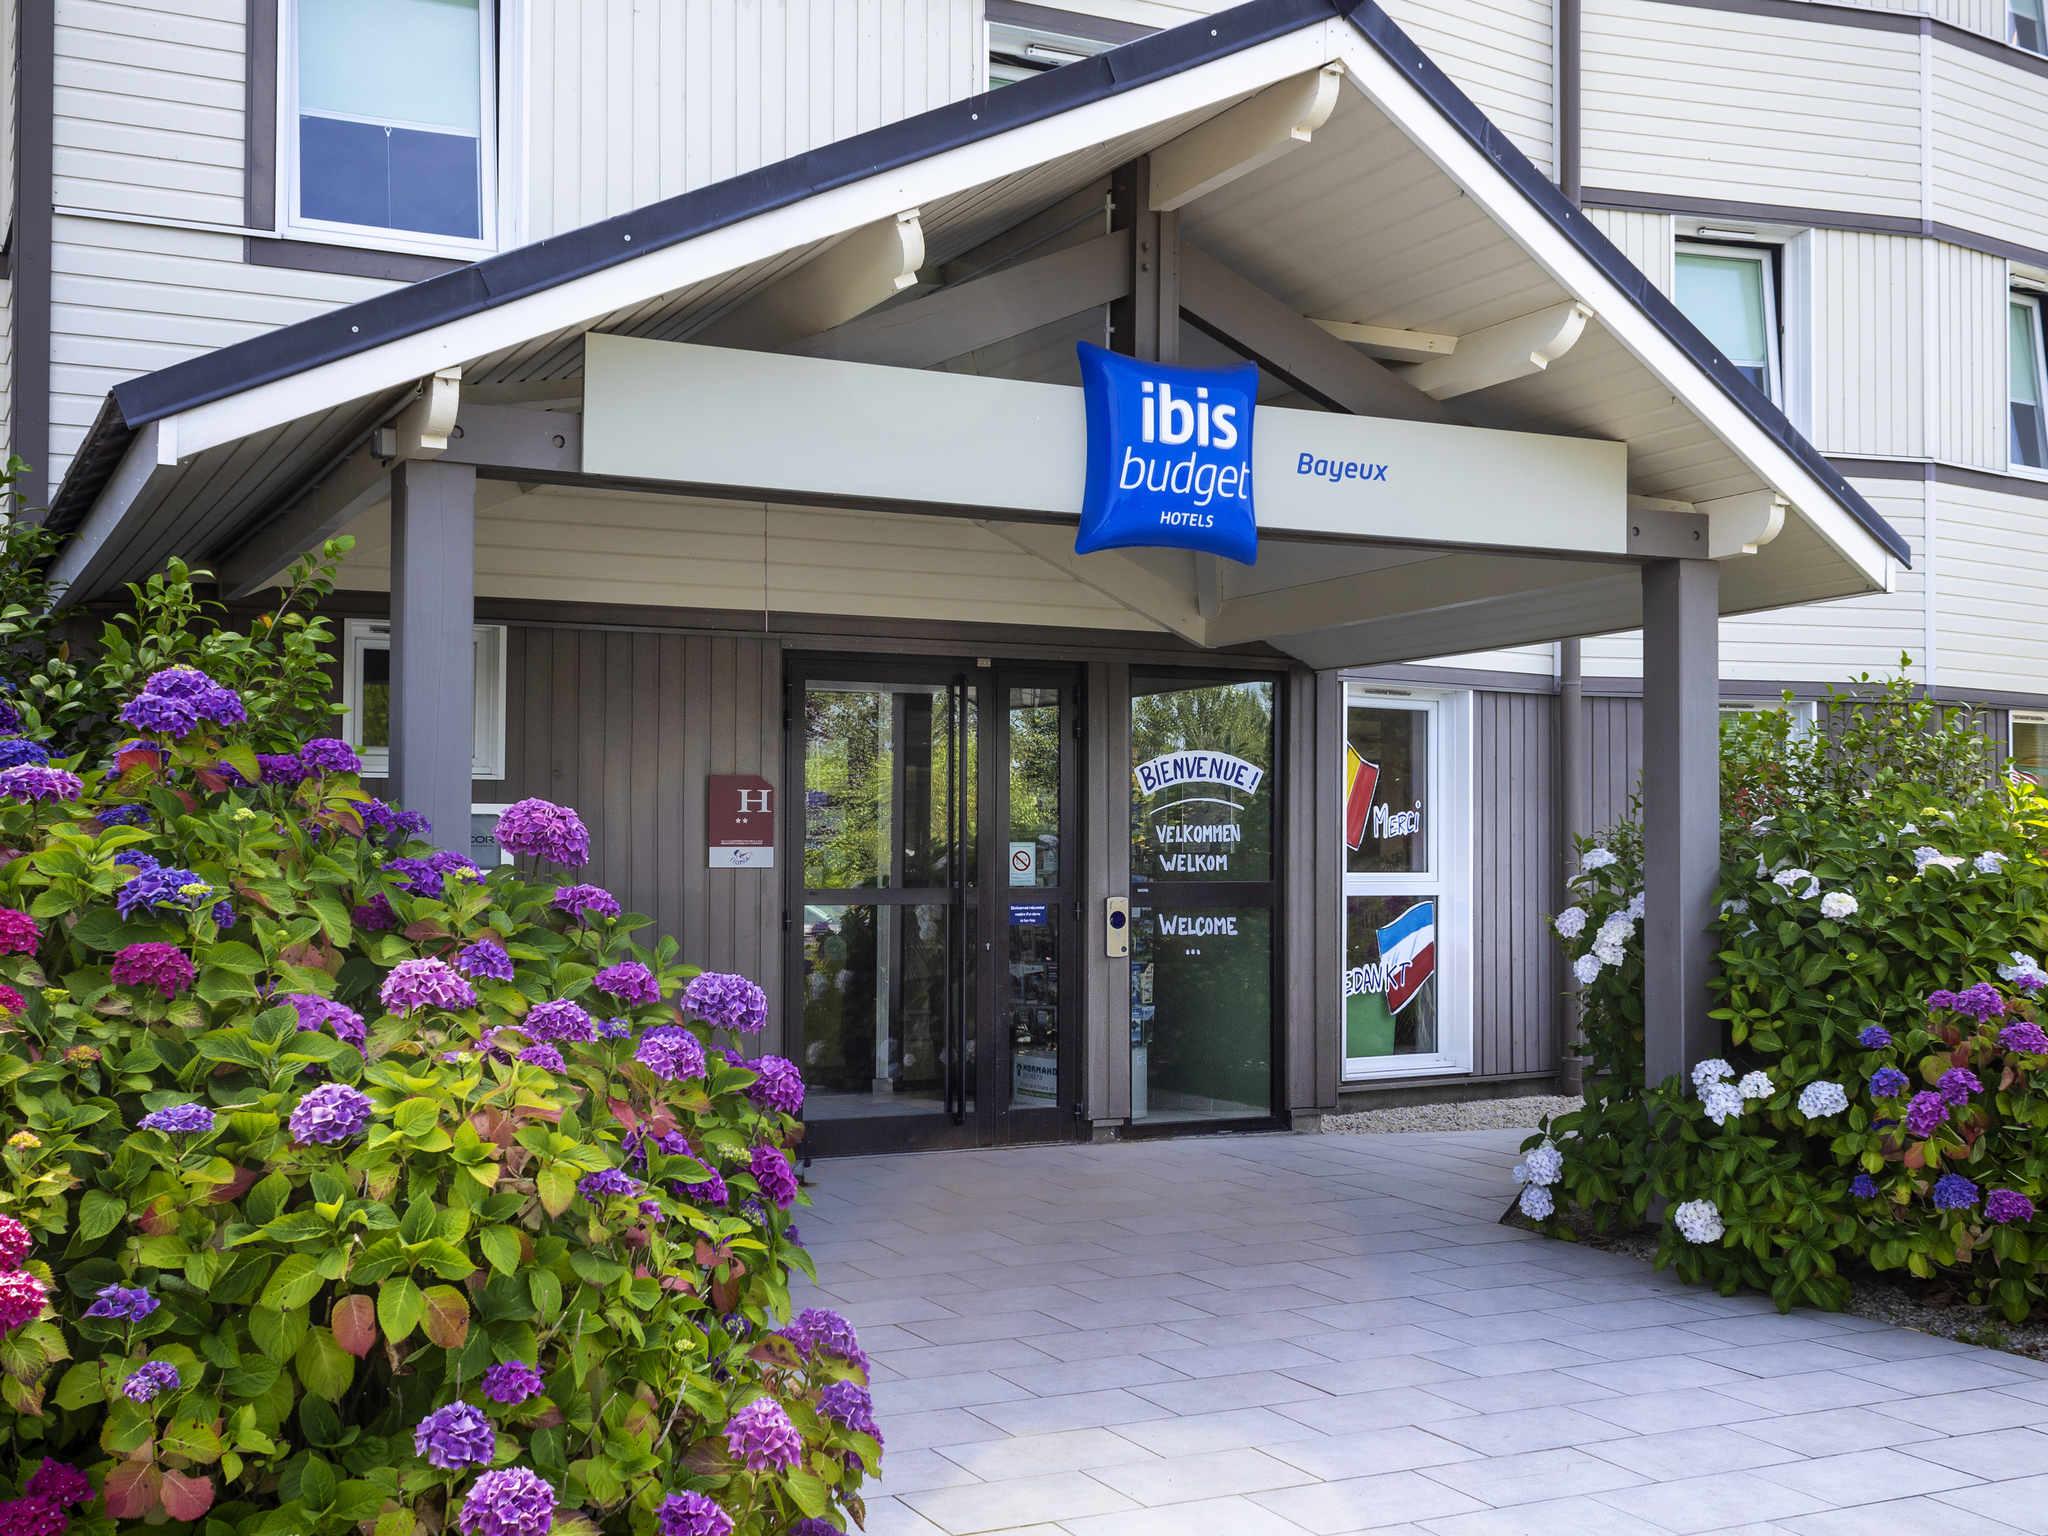 酒店 – ibis budget Bayeux